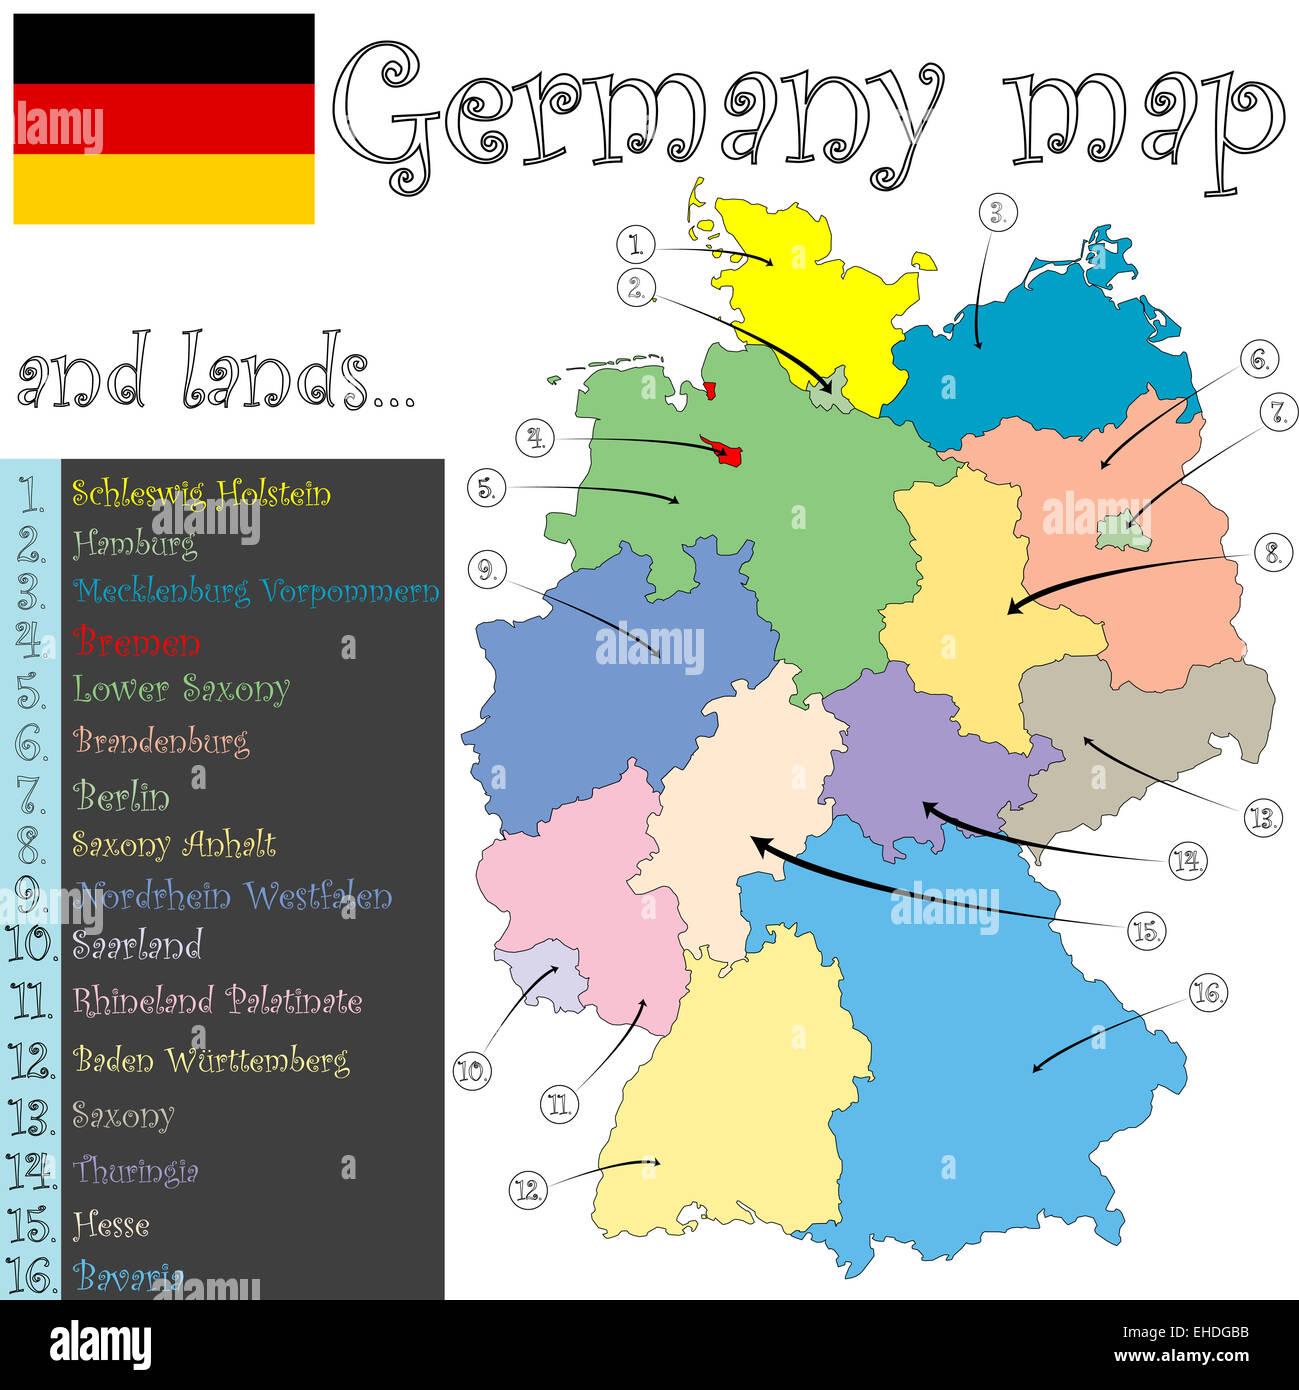 c8alamycompEHDGBBgermanymapandlandsEHD – Map of German Lander